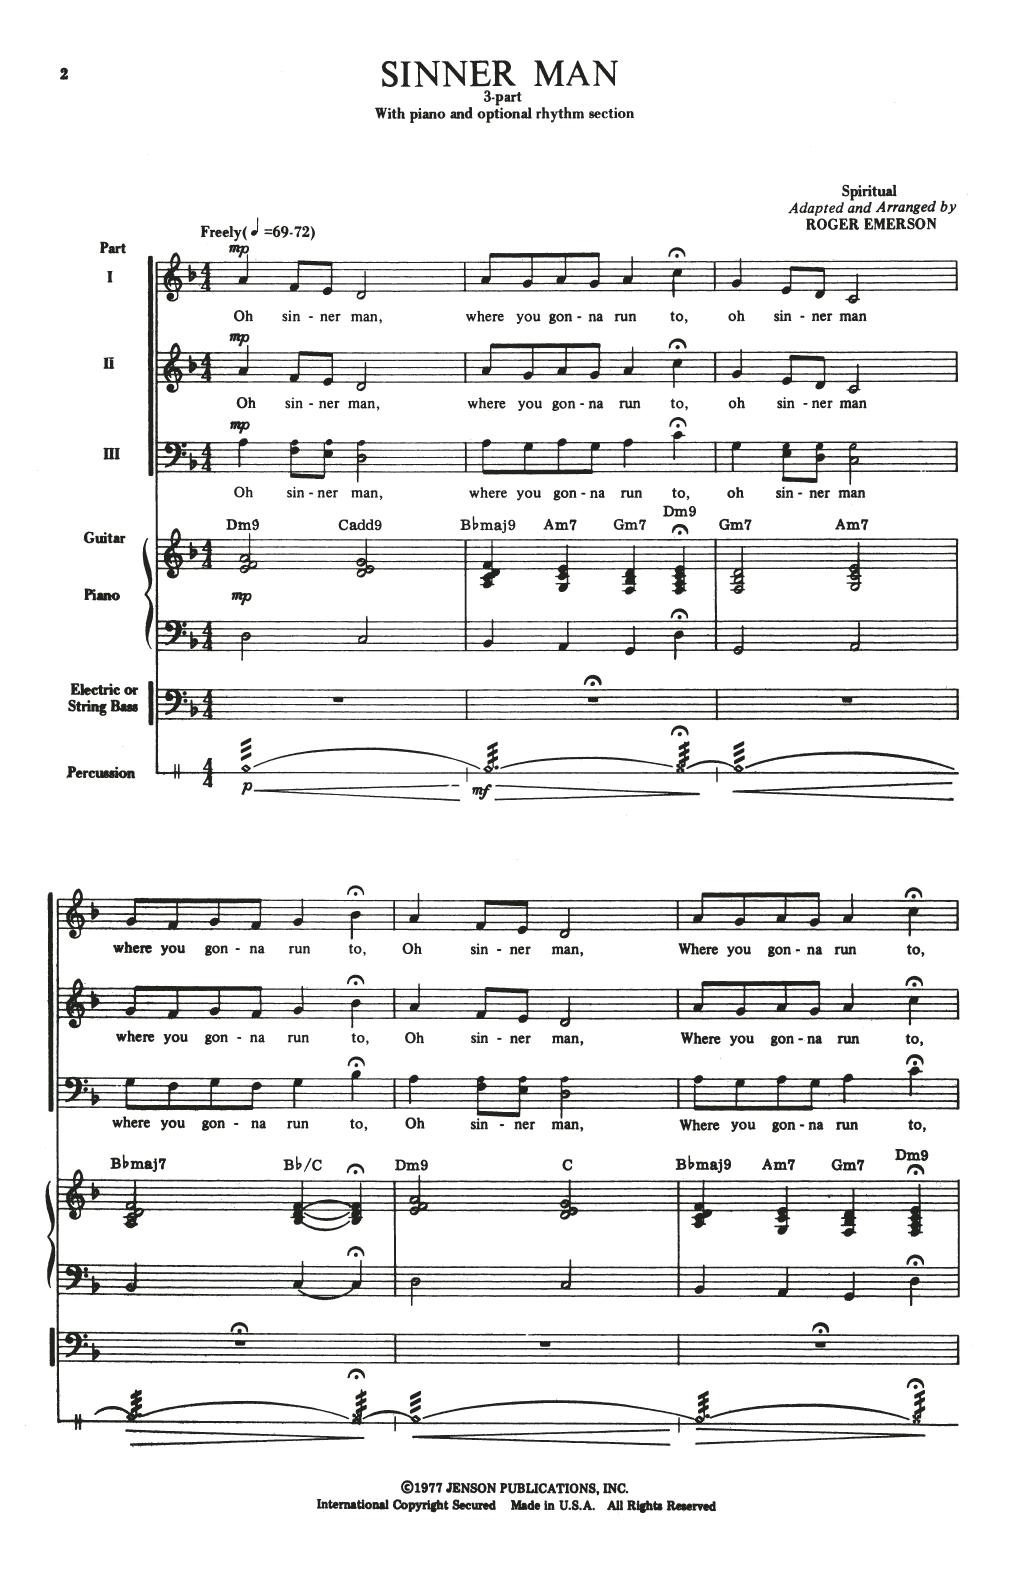 Partition chorale Sinner Man (arr. Roger Emerson) de Traditional Spiritual - 3 voix mixtes